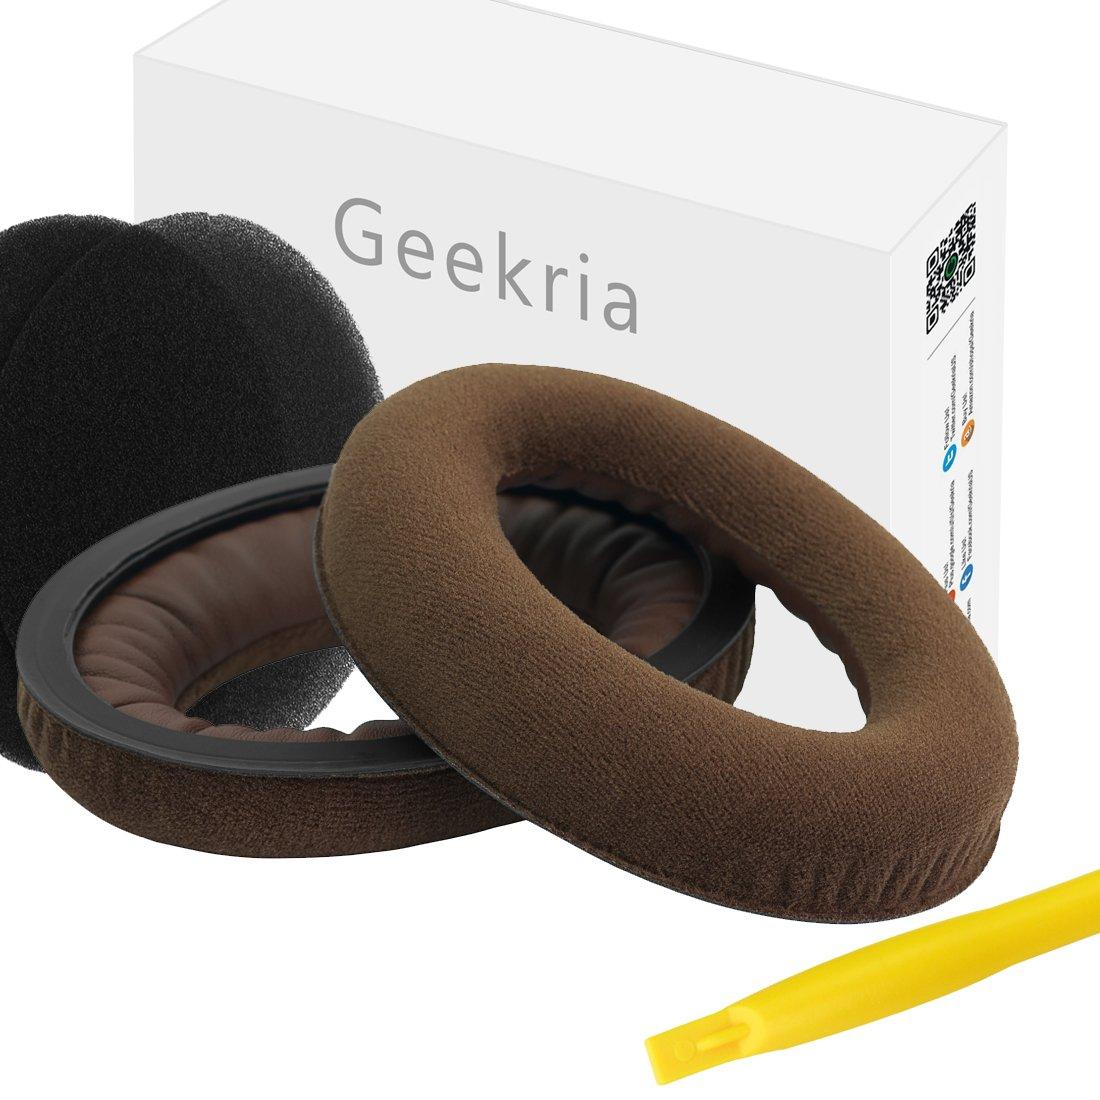 HD595 Lamy Velvet HD598CS Geekria Earpads Replacement for HD598 HD555 HD598SR HD598SE HD518 Headphones Replacement Ear Pad//Ear Cushion//Ear Cups//Ear Cover//Earpad Repair Parts